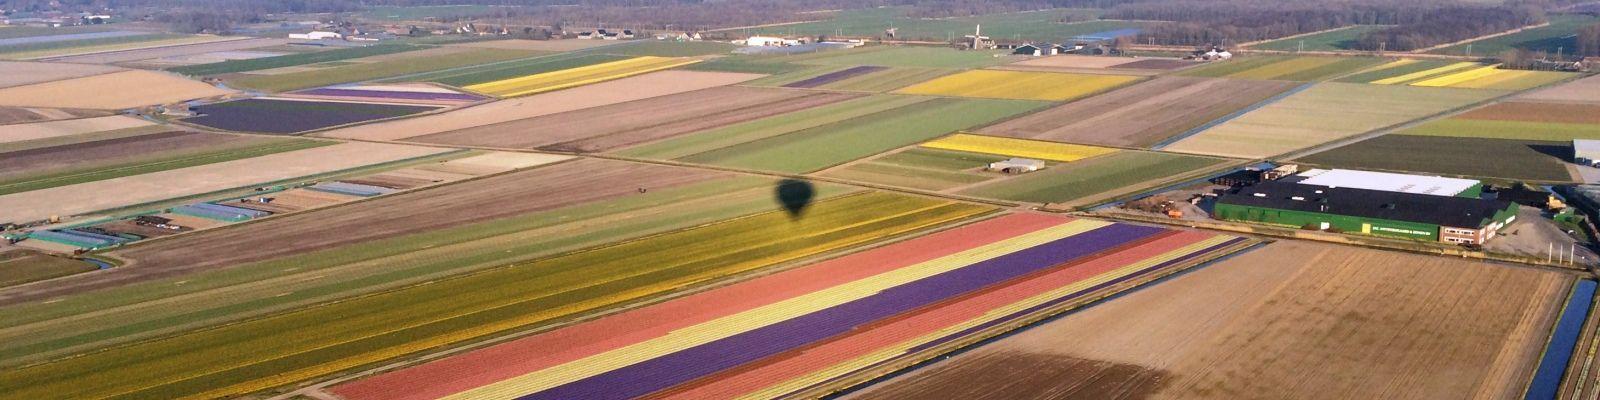 Ballonvaren boven de bollenstreek